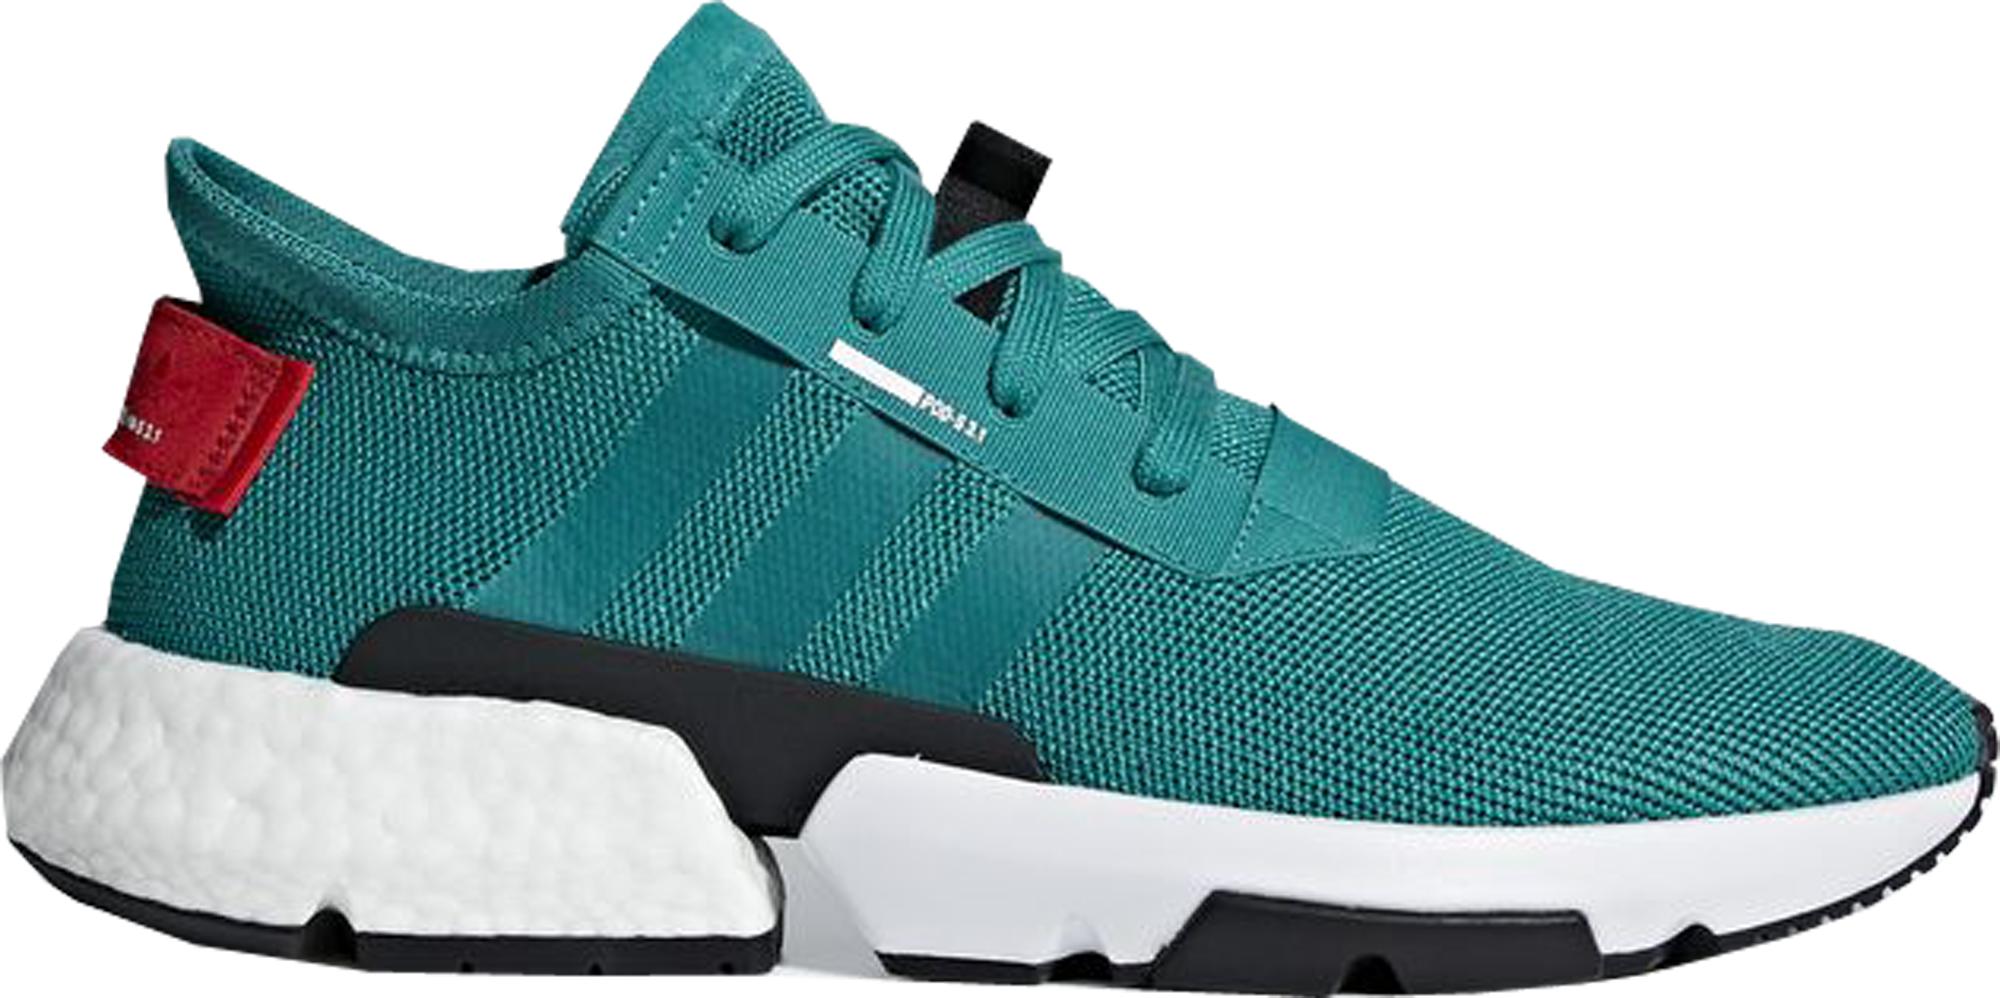 adidas POD-S3.1 Blast Emerald